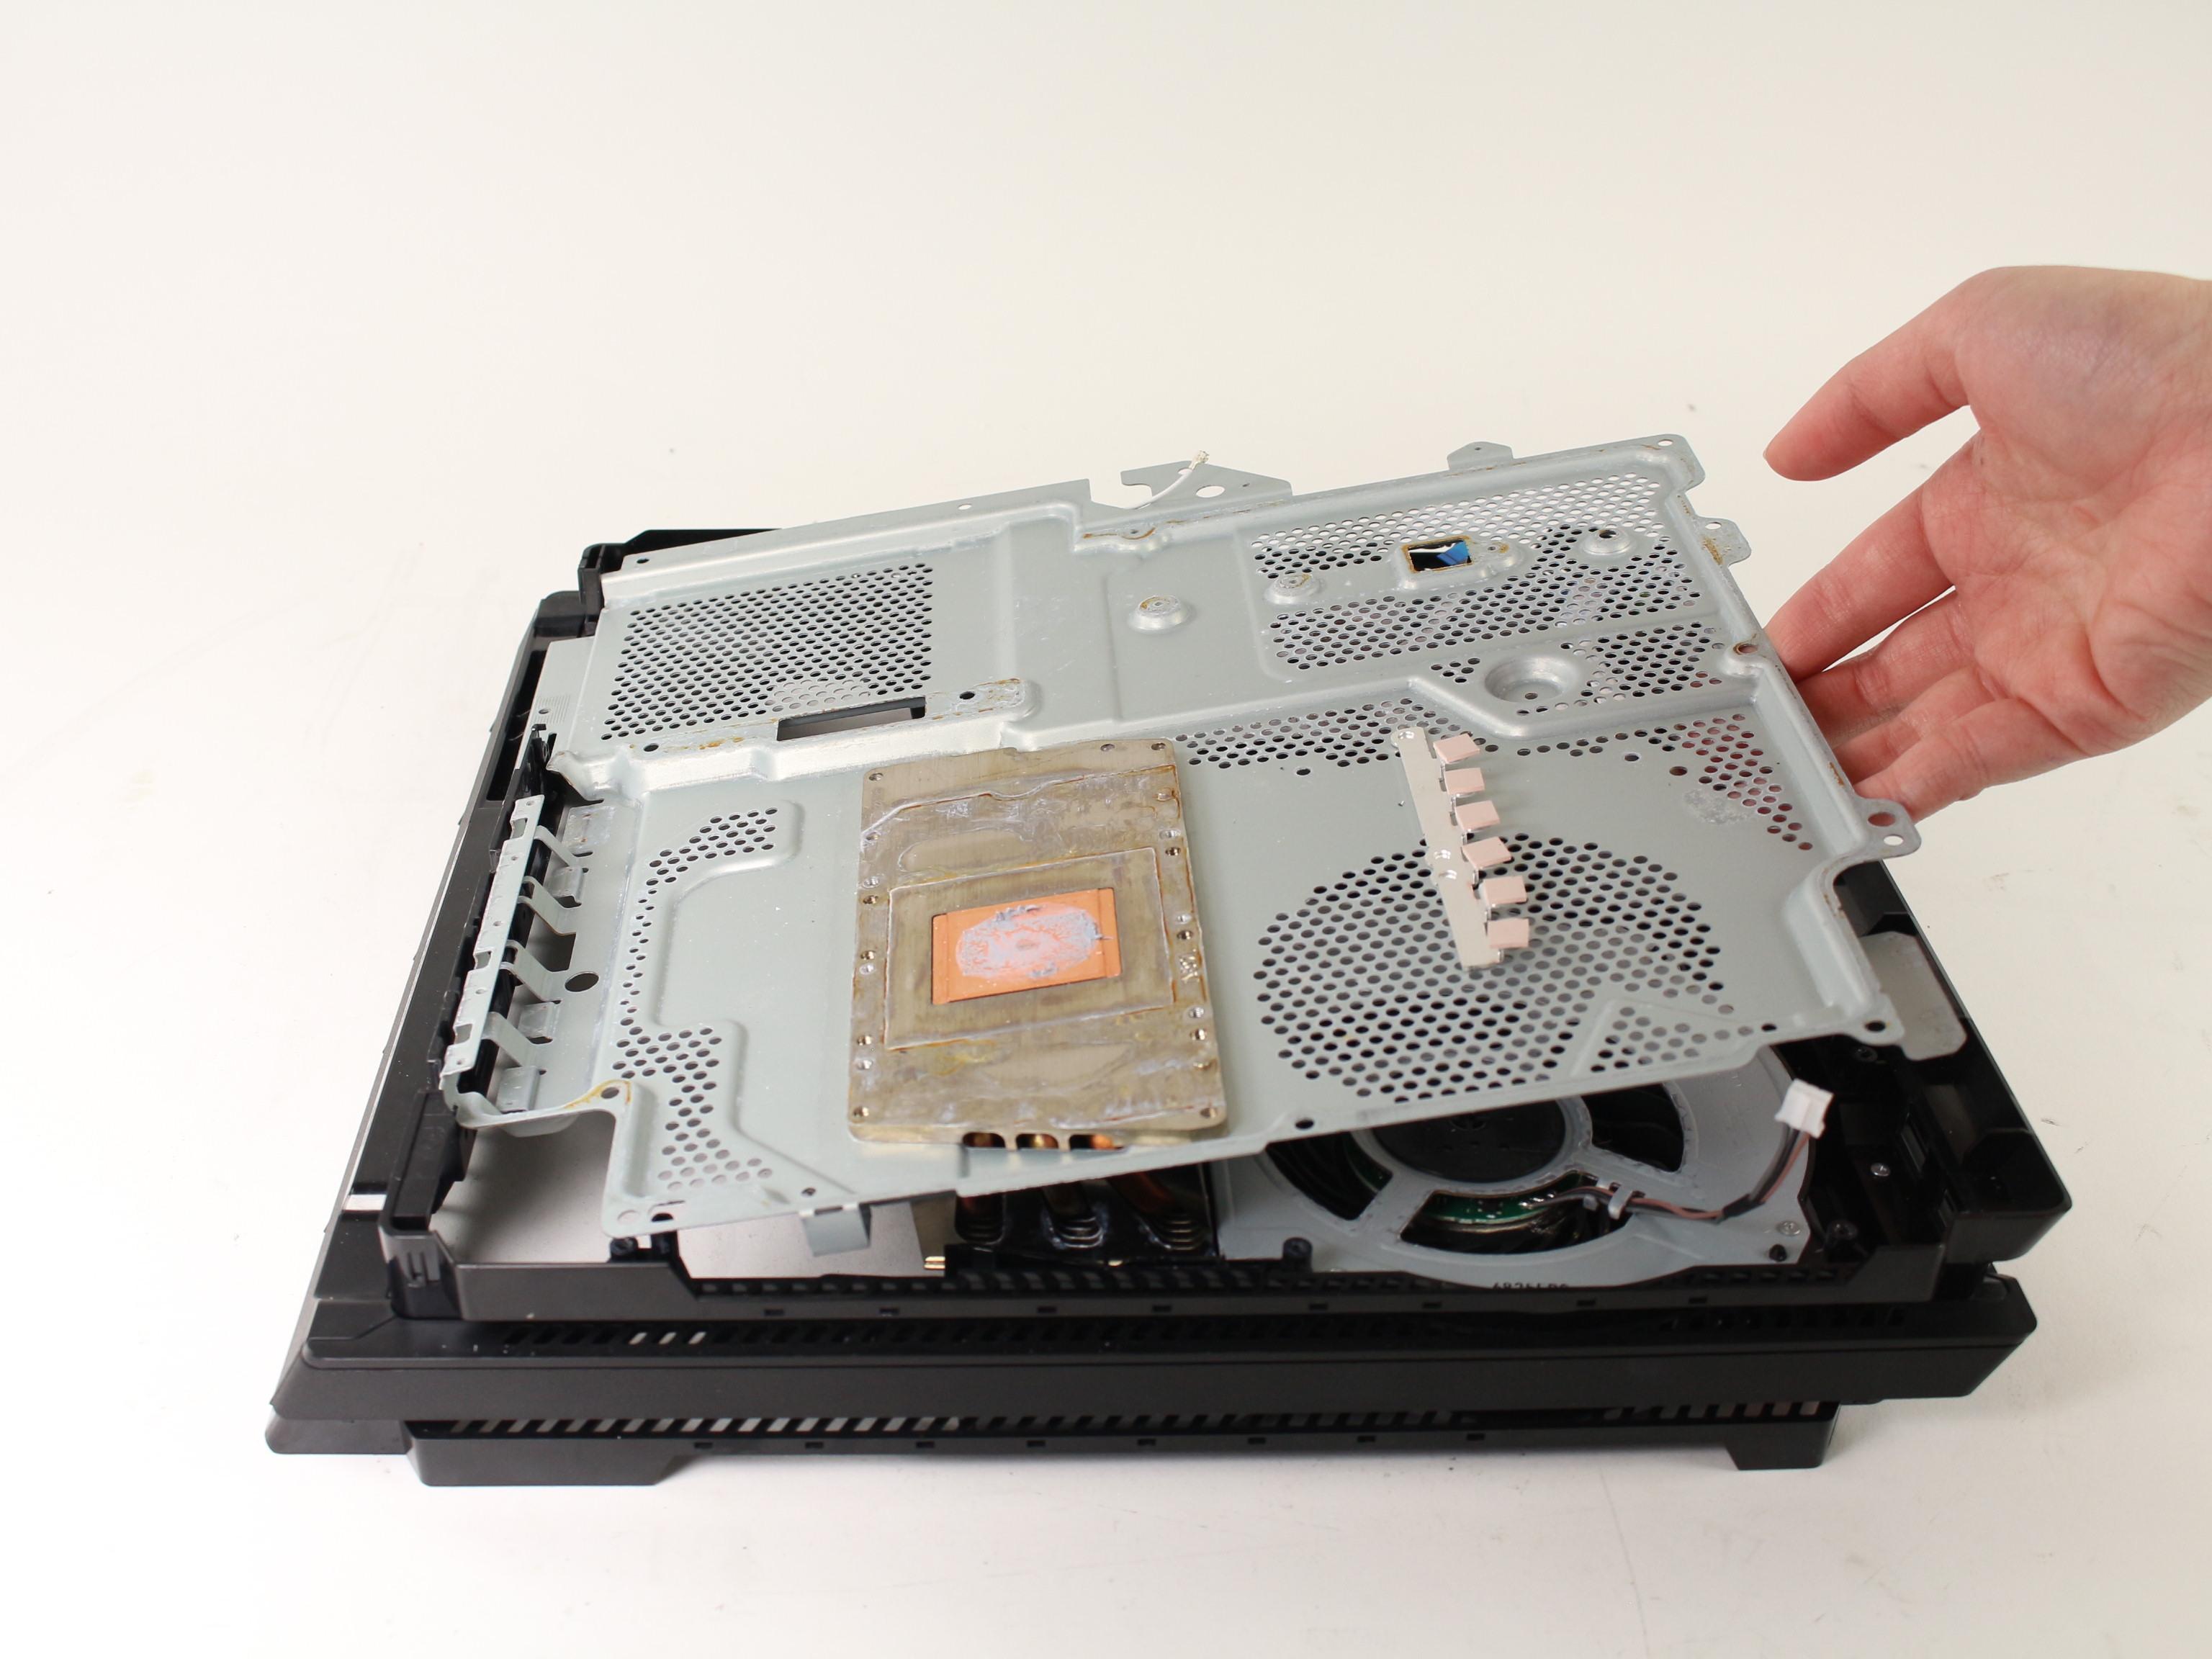 PlayStation 4 Pro Repair - iFixit